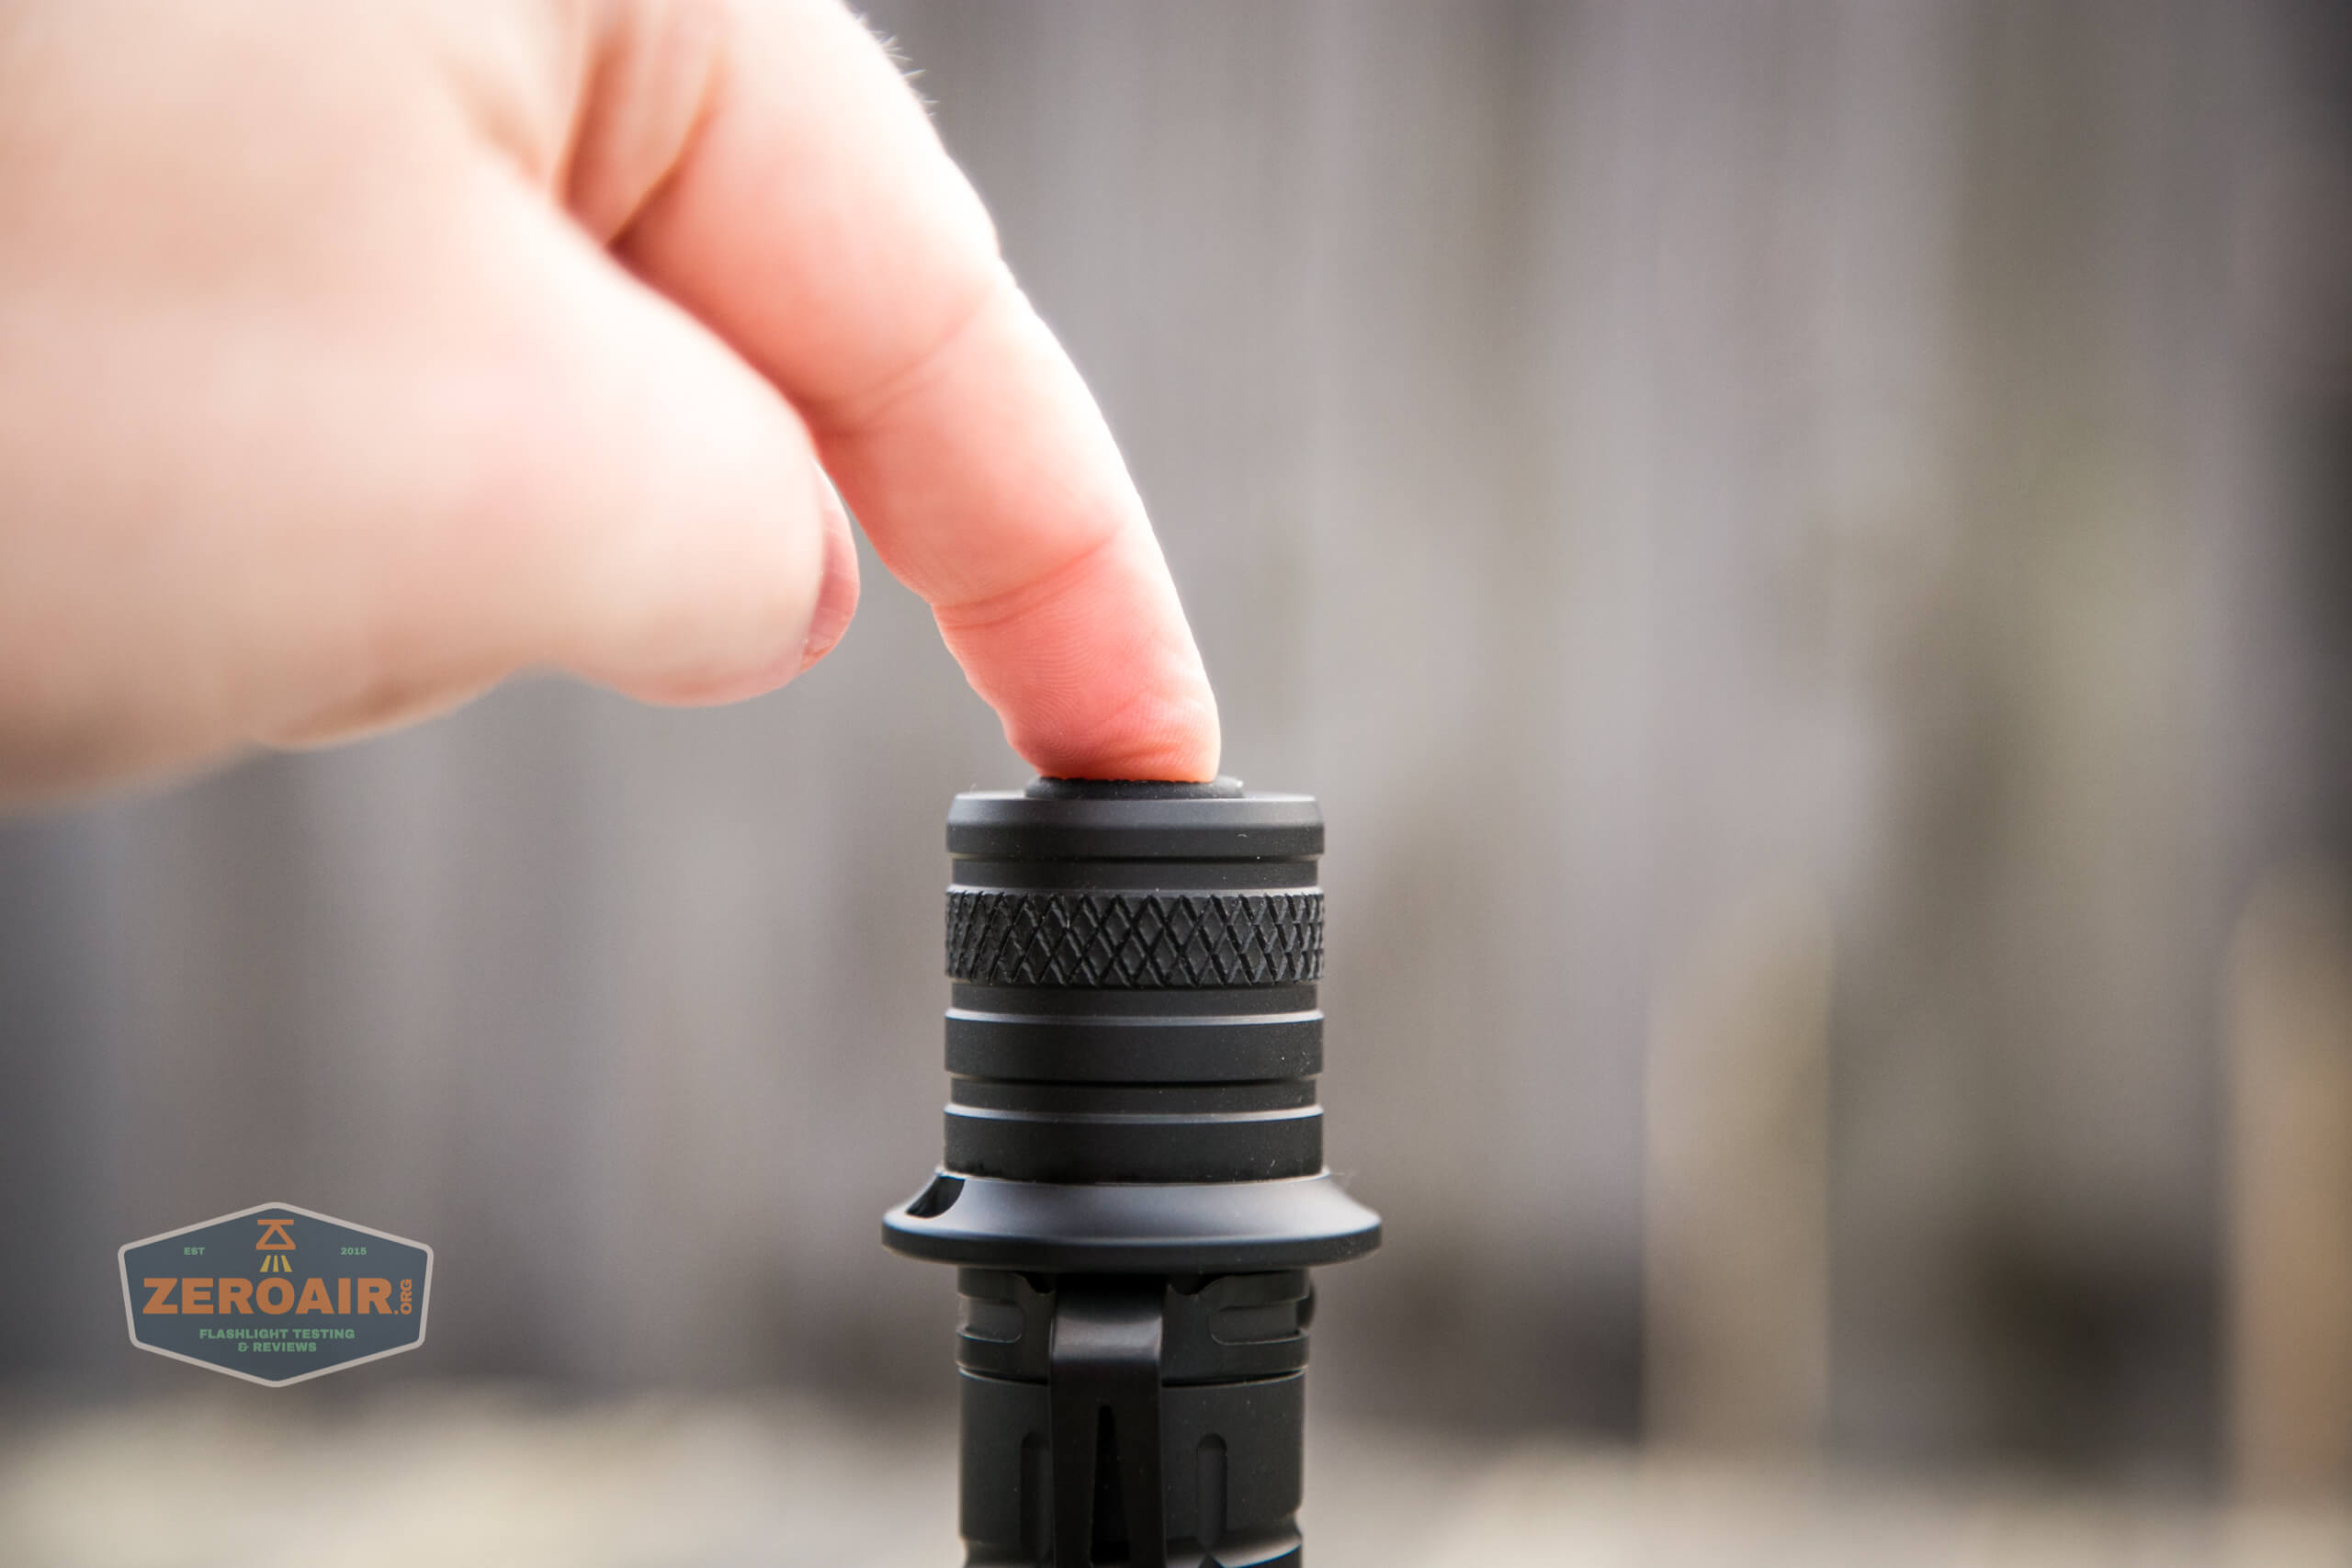 Acebeam L35 brightest tactical flashlight actuation